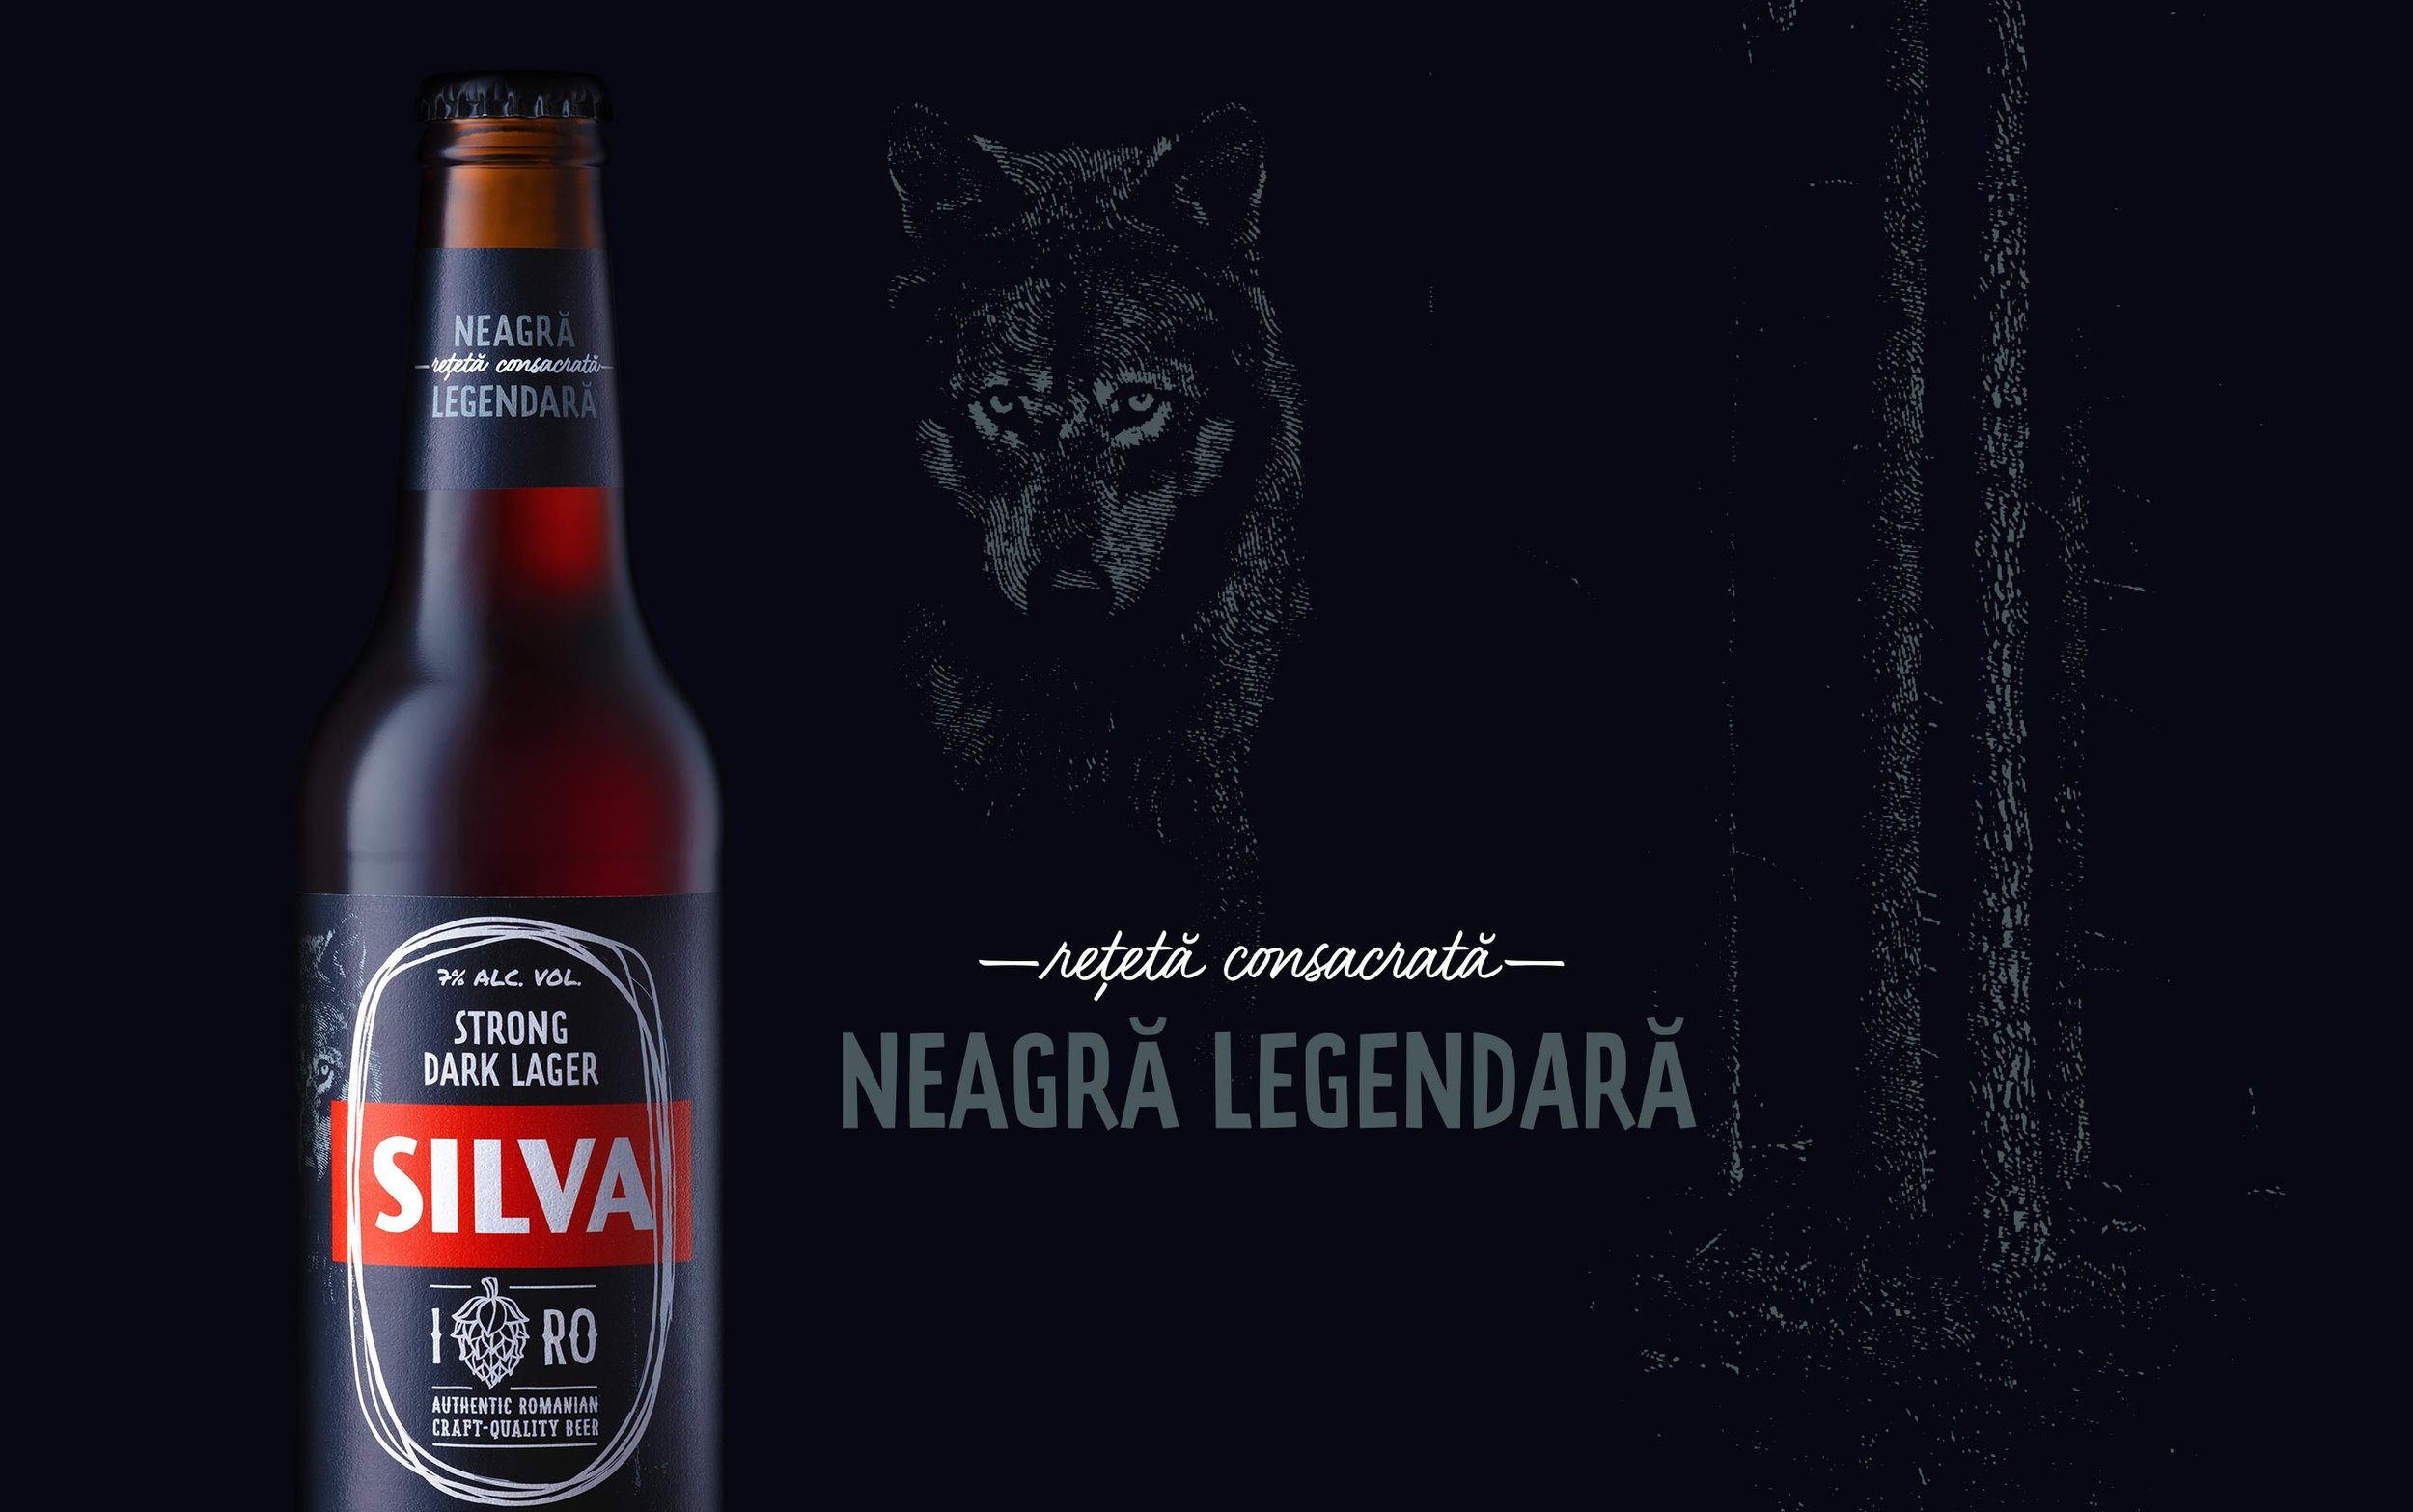 03-Silva-Packaging-Design-Strong-Dark-Lager-by-Brandient.jpg